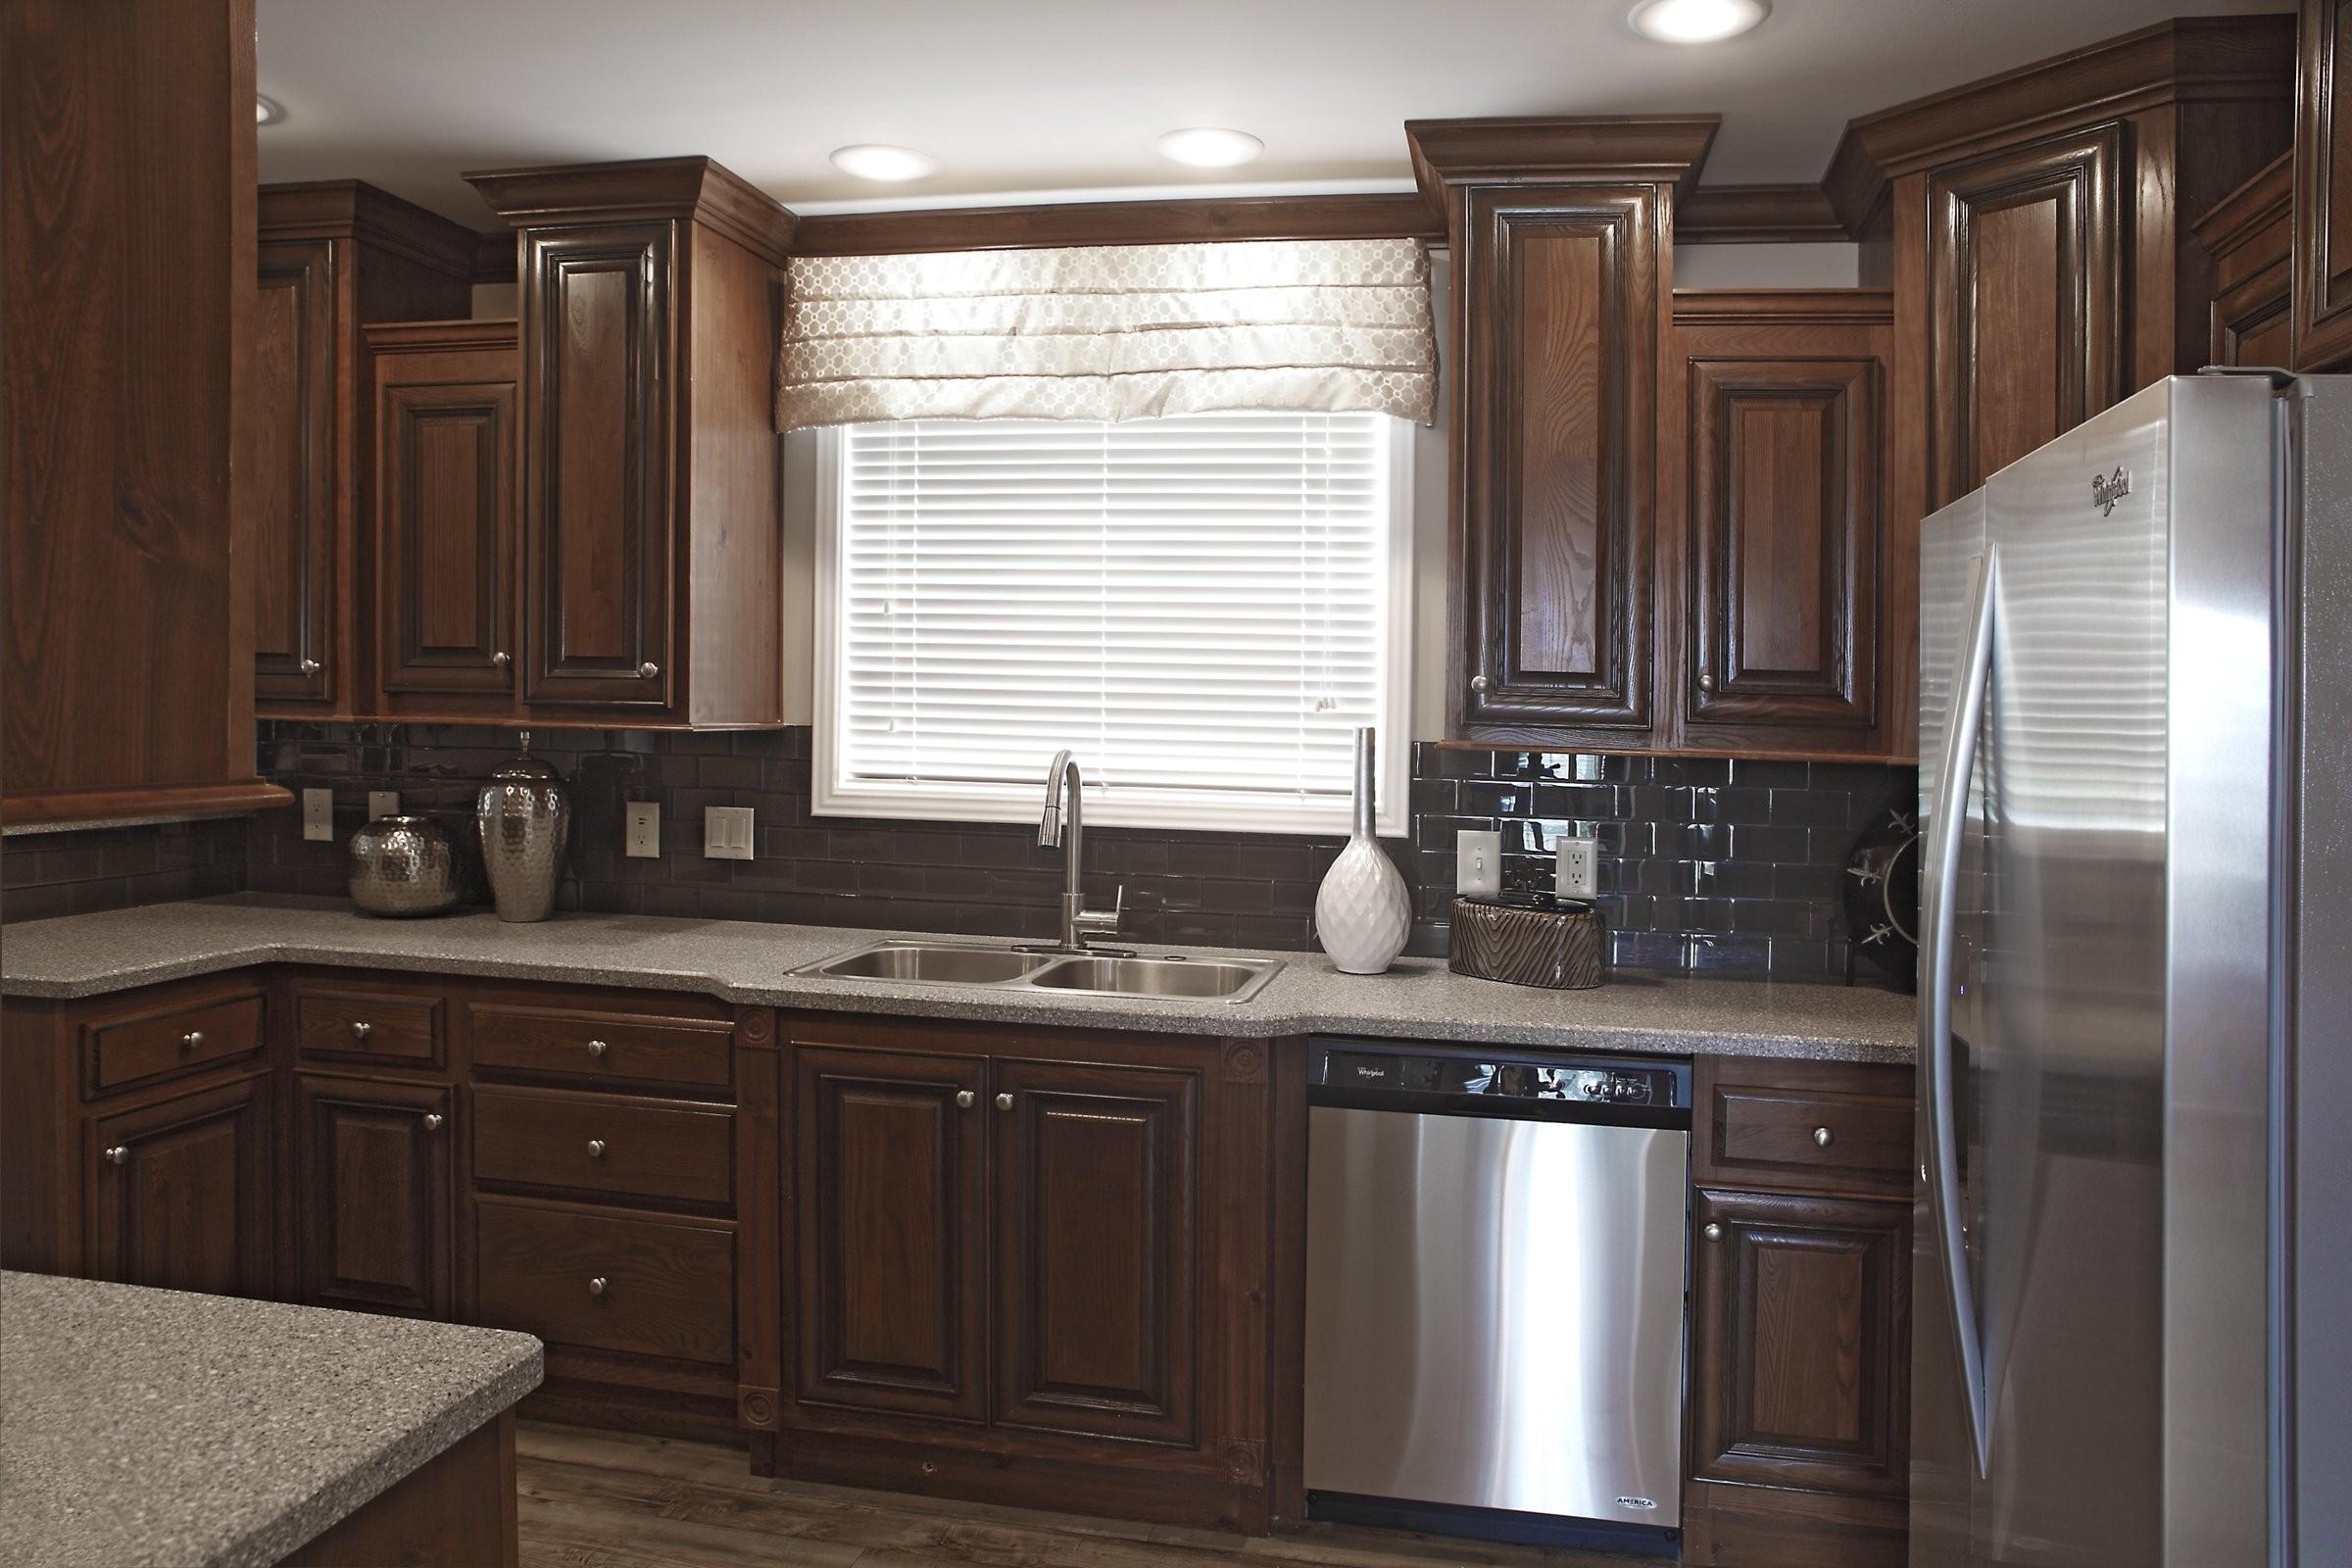 Kitchen sink and counter.jpg